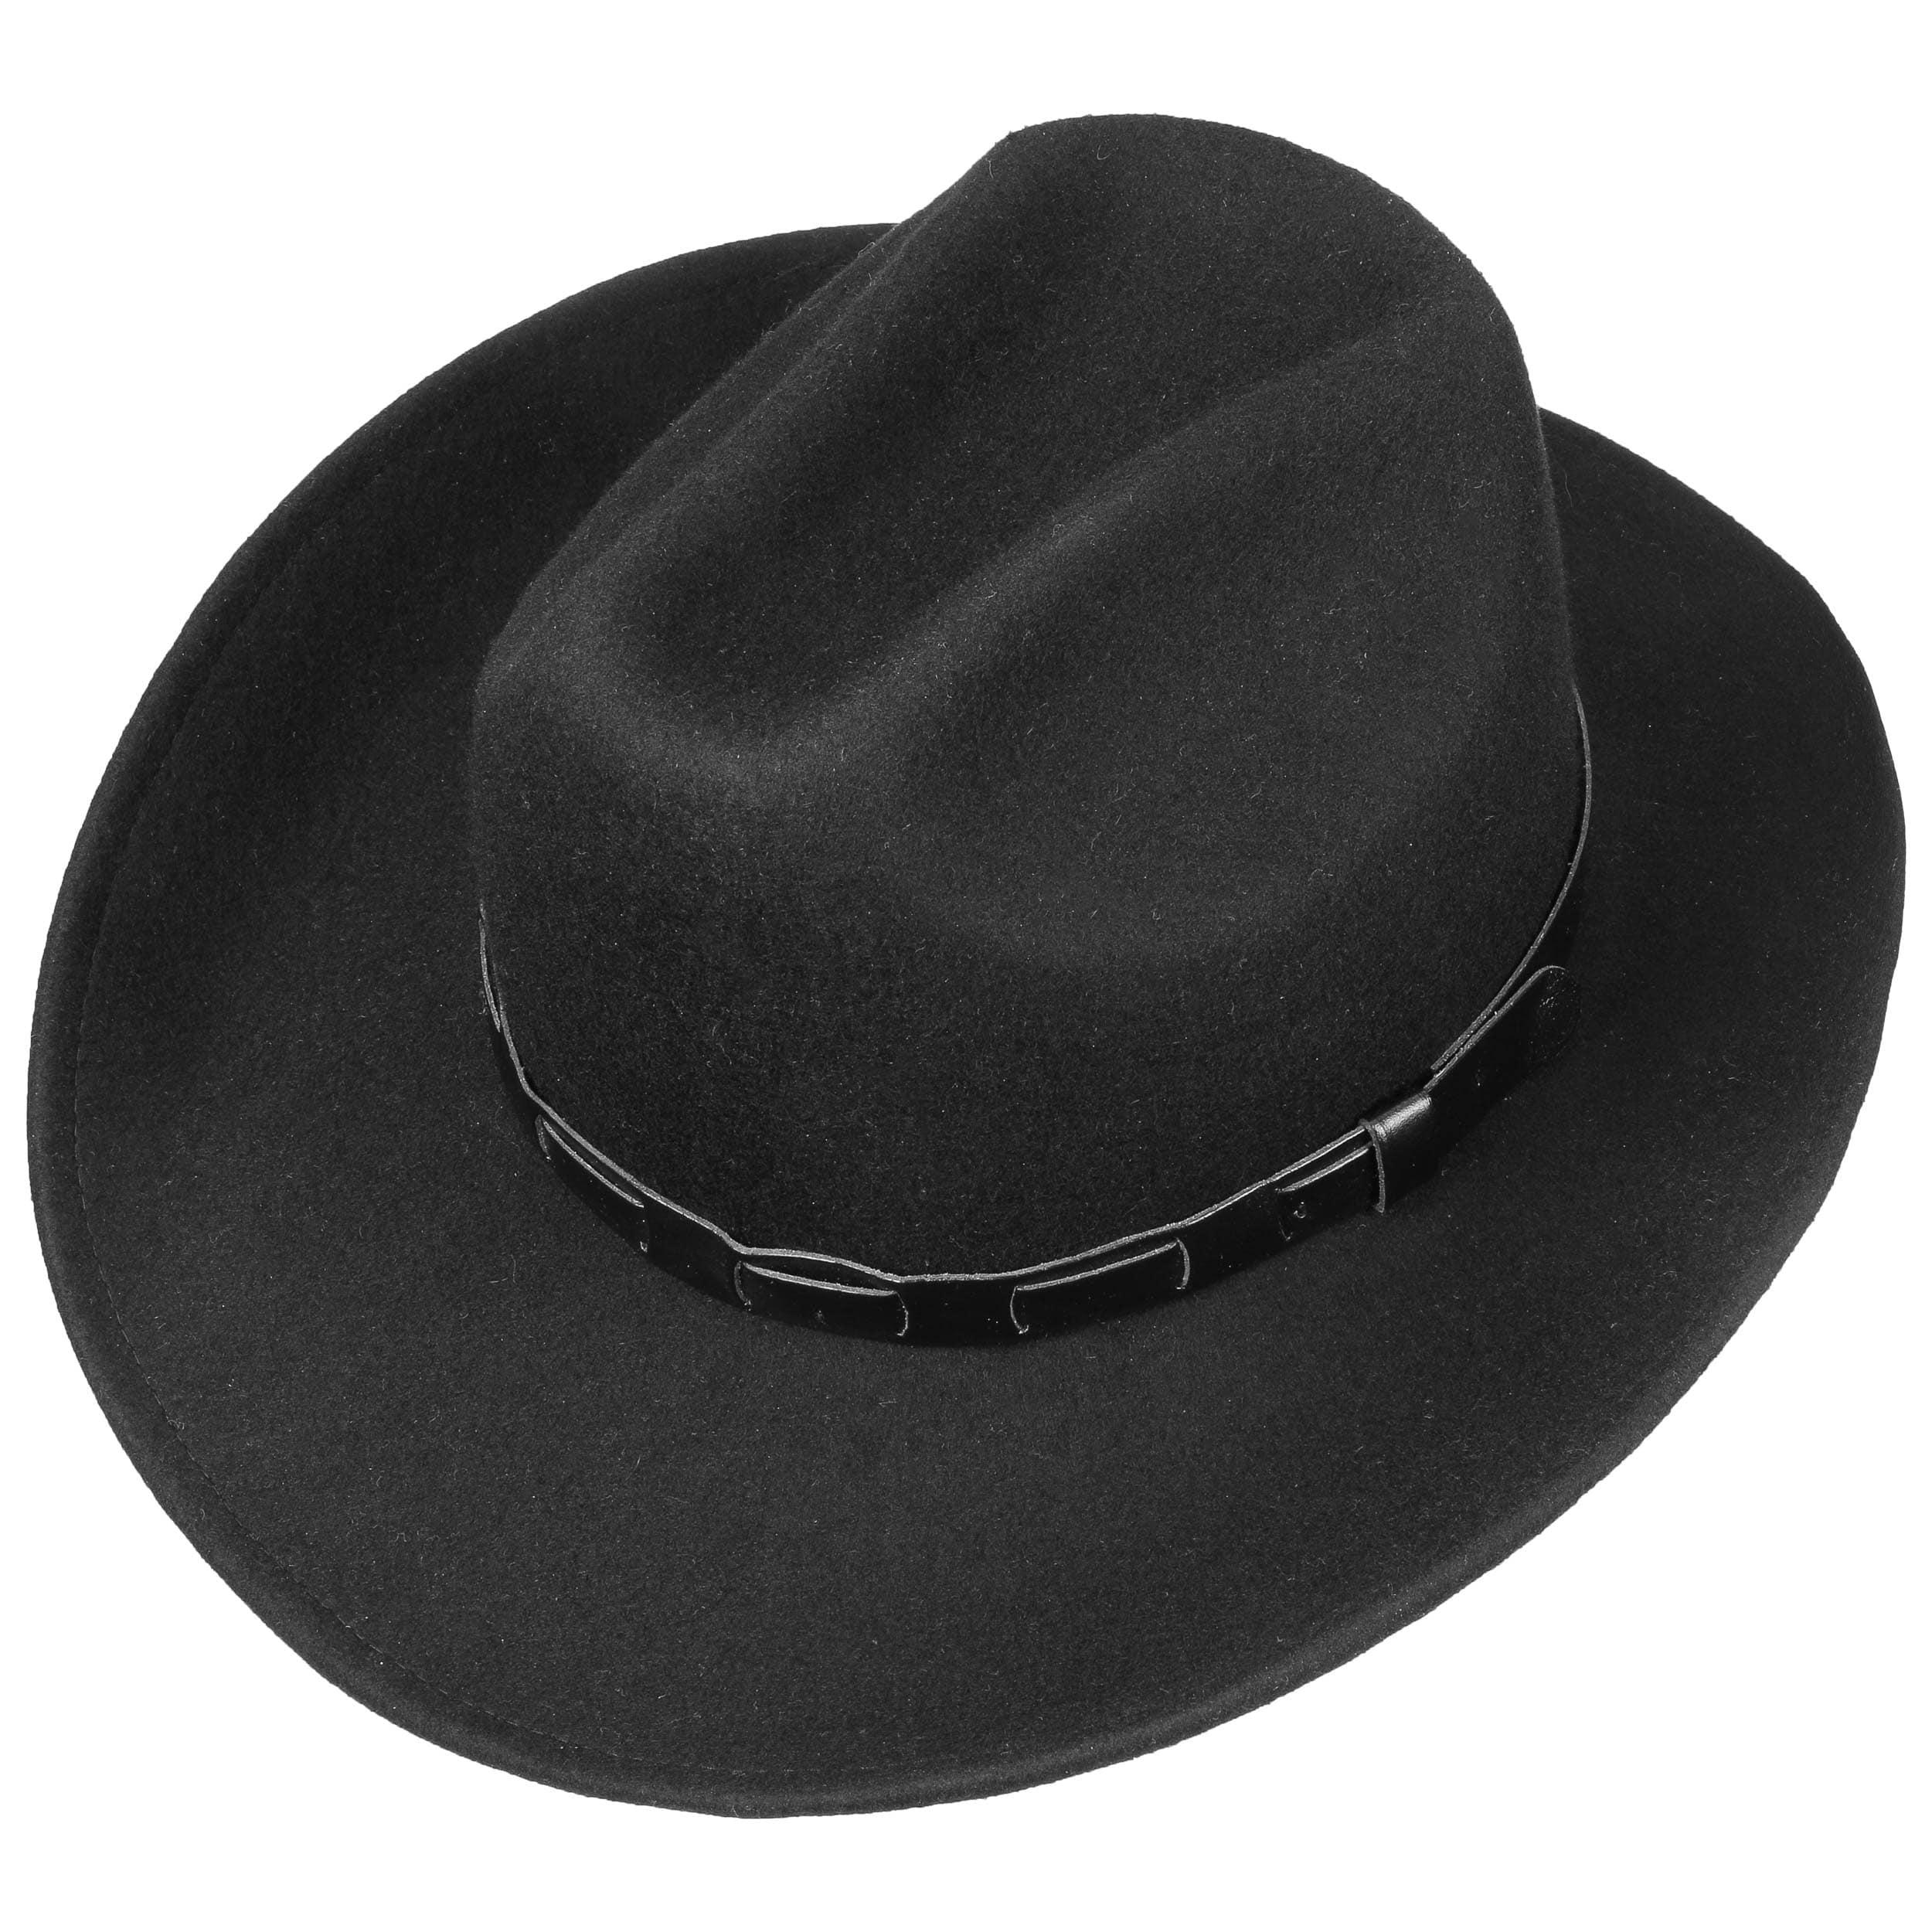 Bill Cody Western Hat by Lipodo Cowboy hats LIPODO SmKcM5